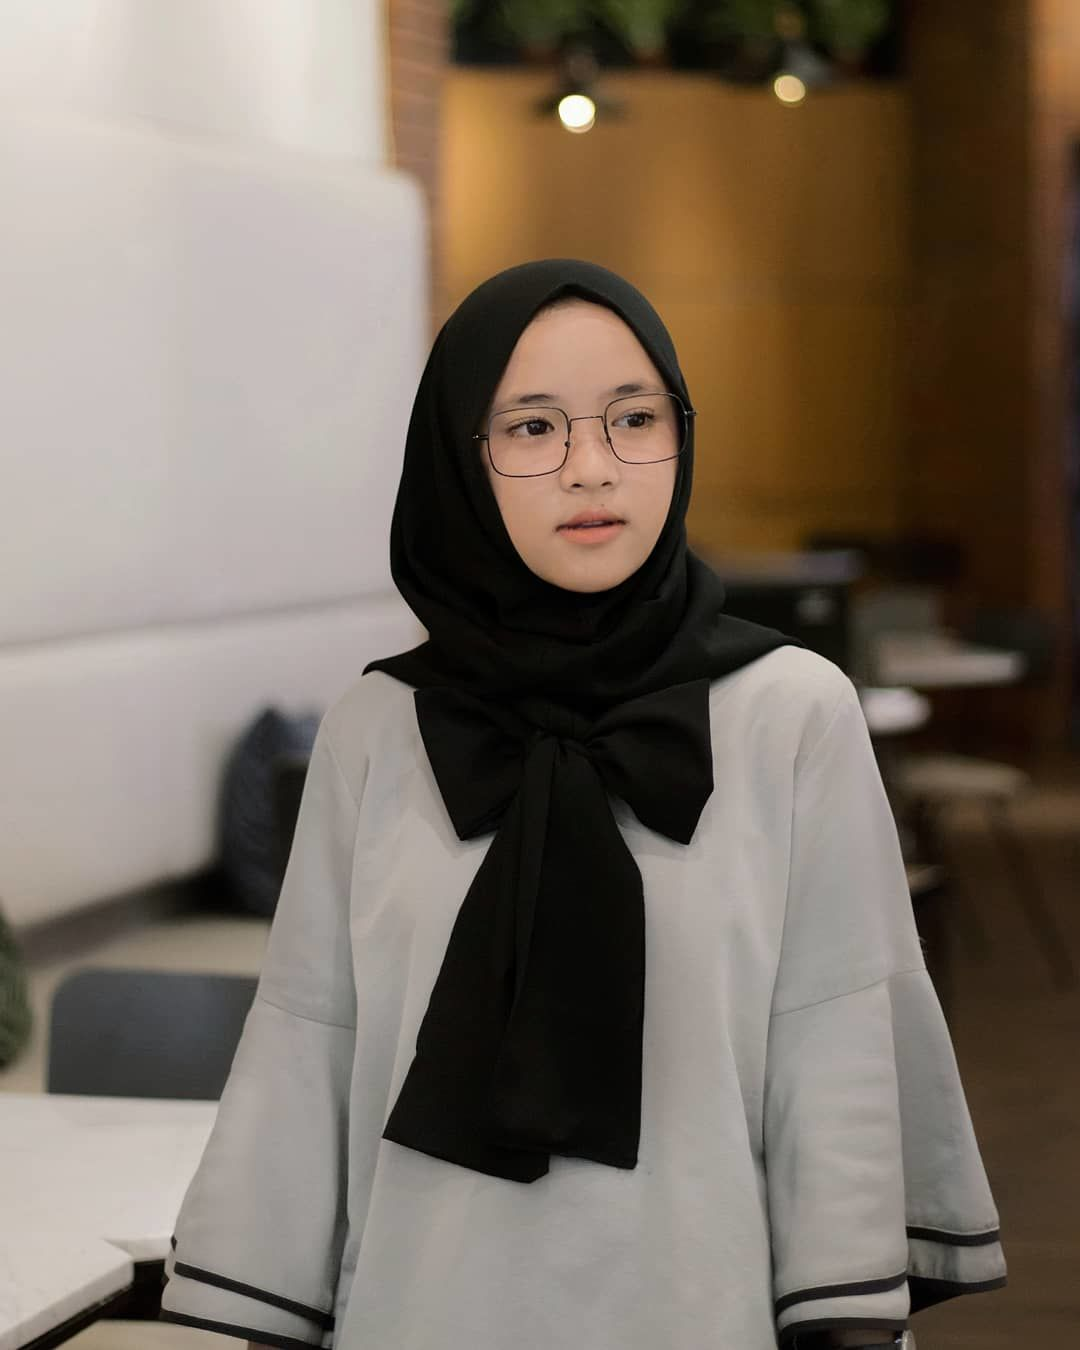 10 style hijab modis ala nissa sabyan, gayanya anak millenial